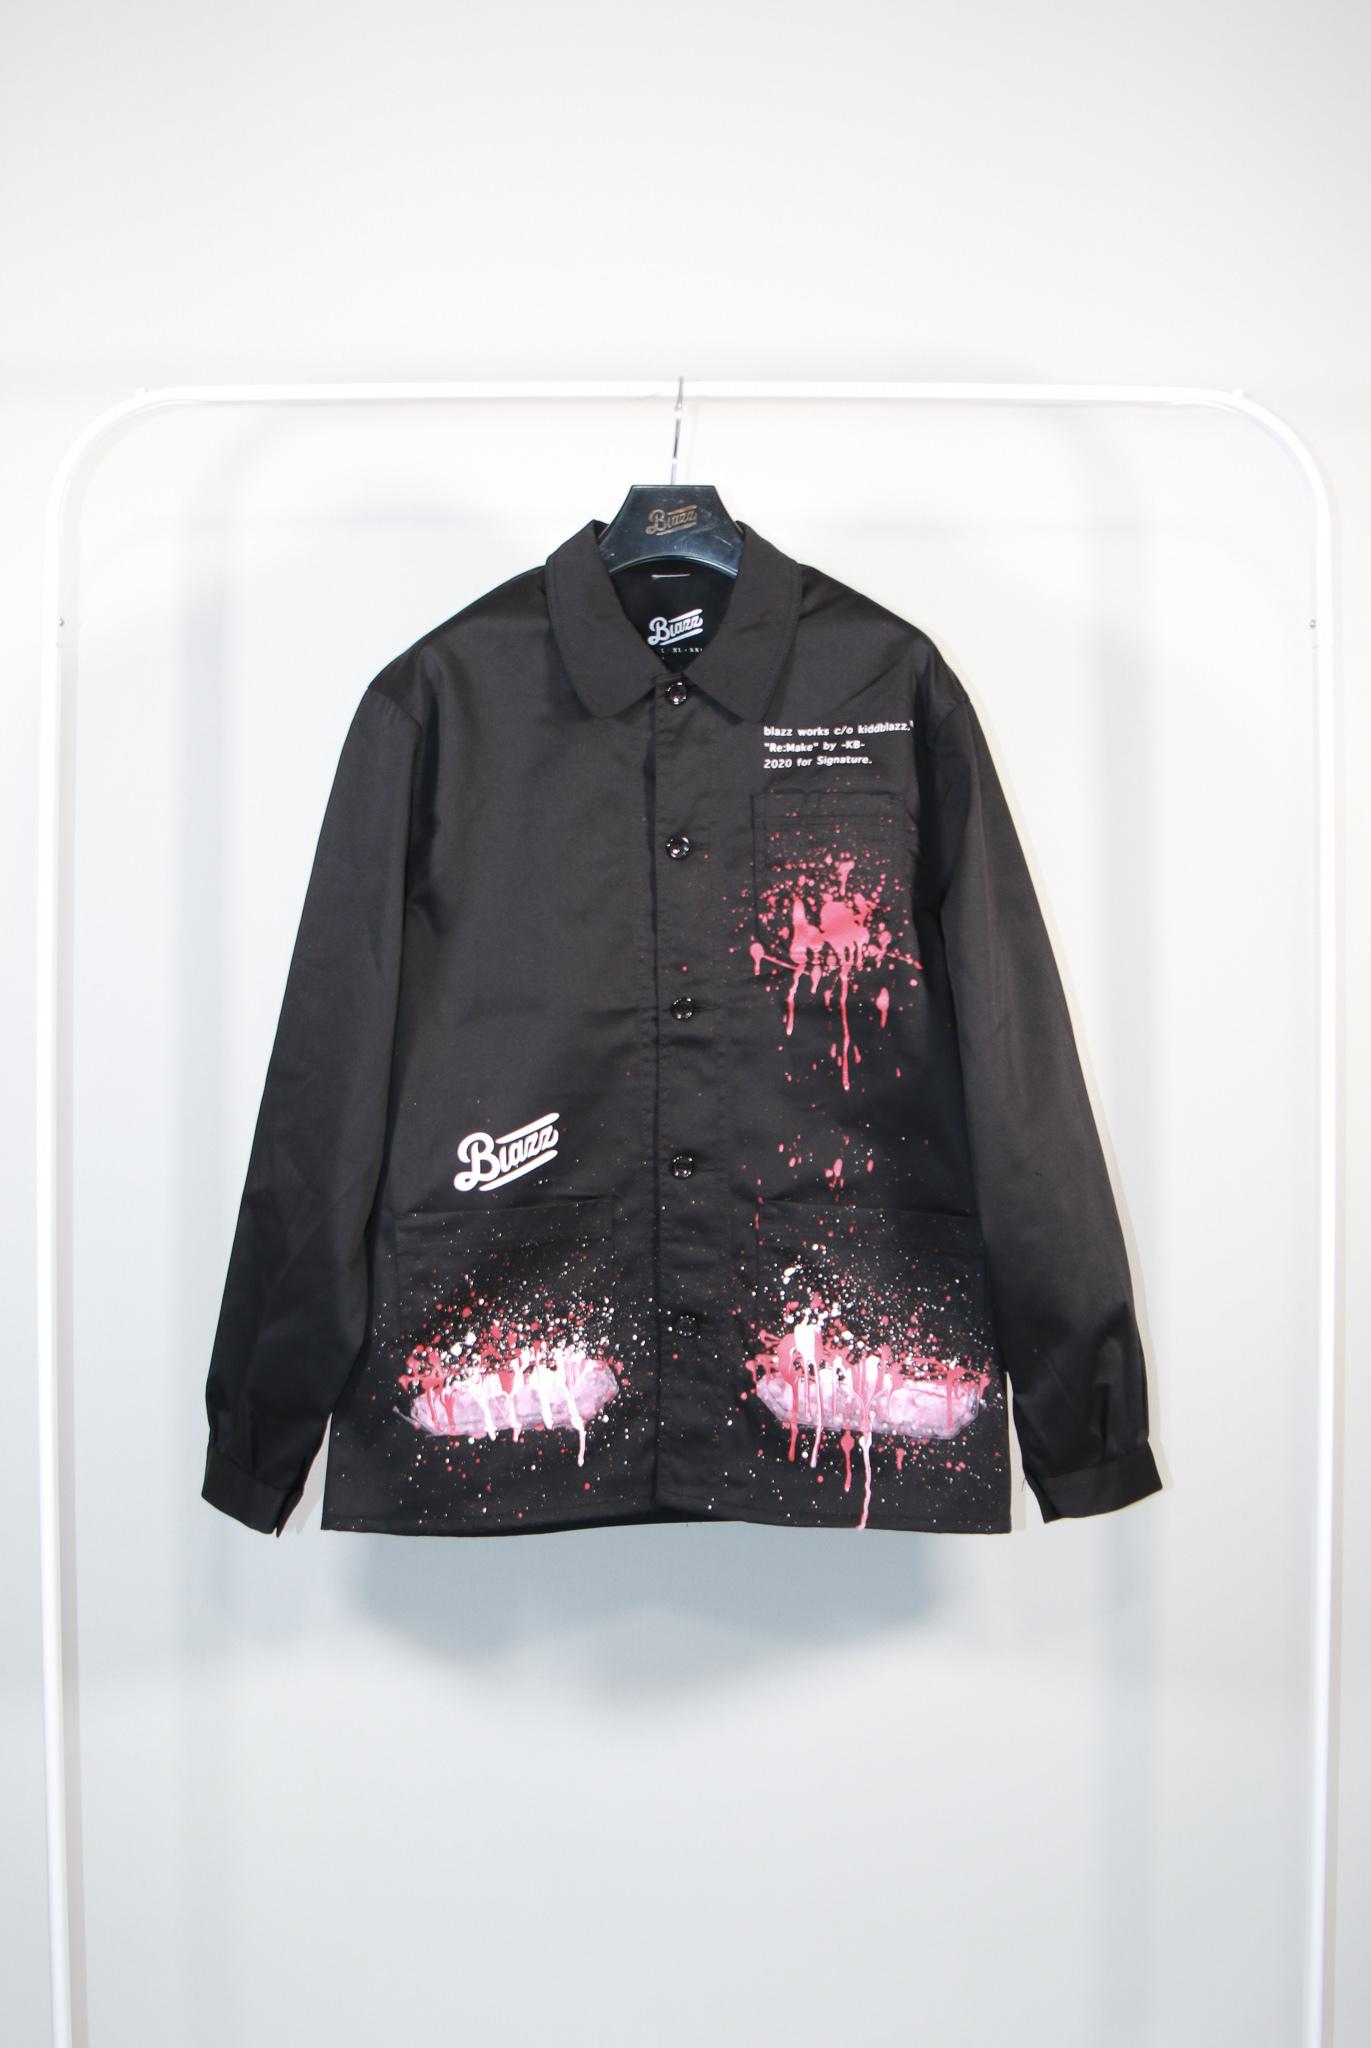 KB Paint French Work Jacket [BLACK]